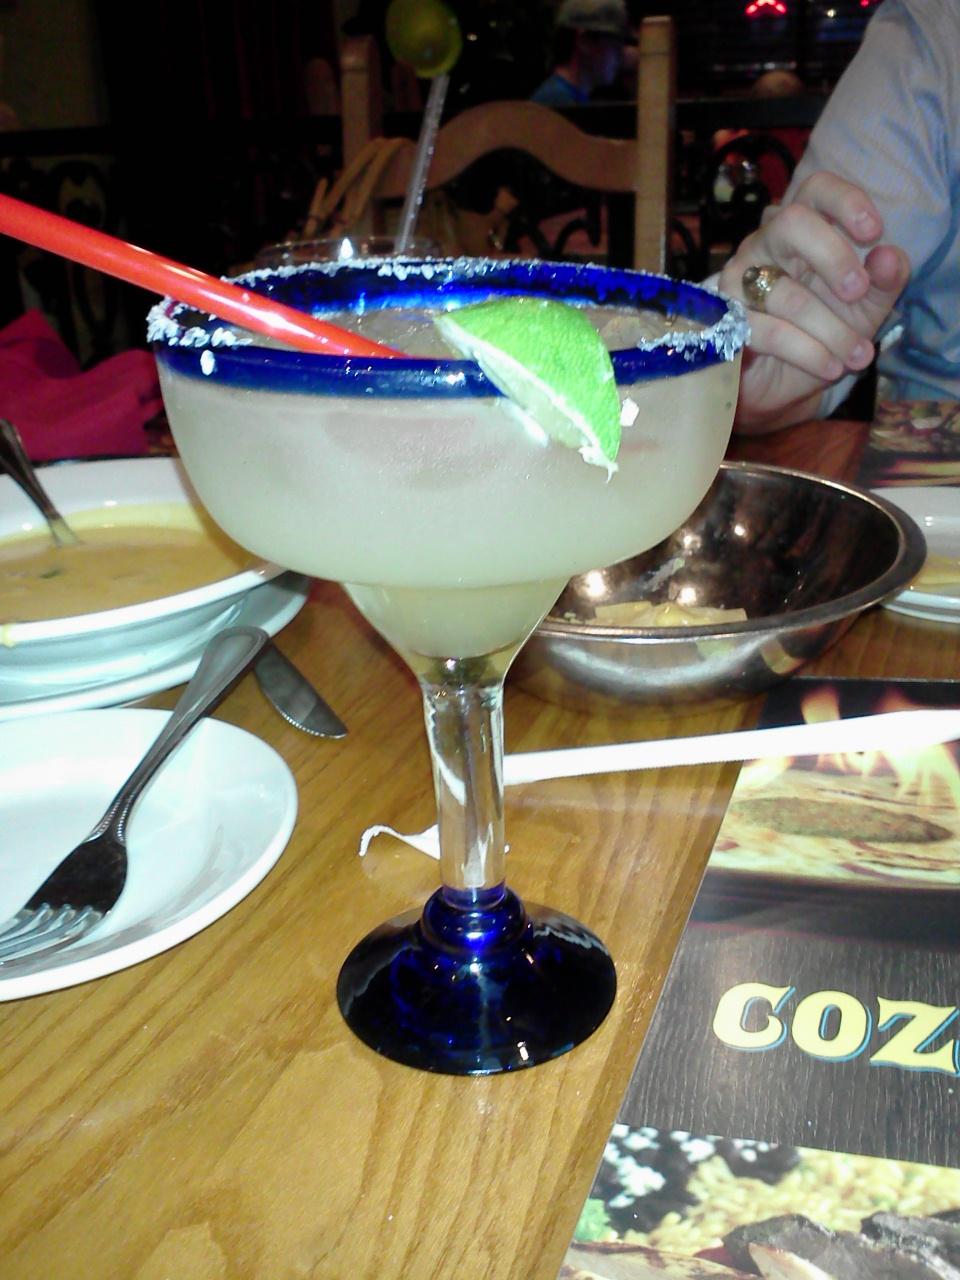 Cozymel's margarita